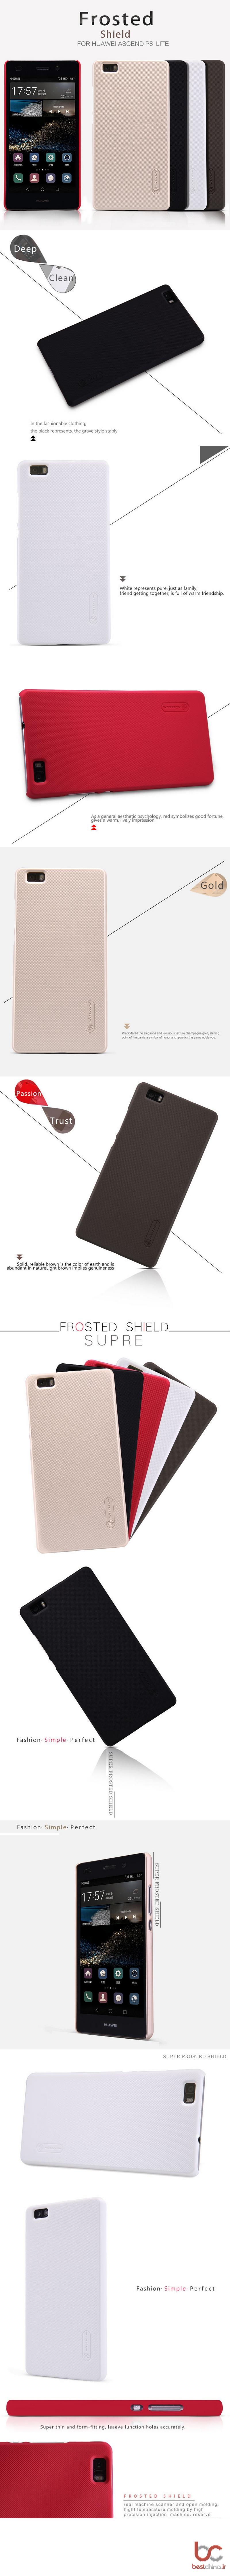 Huawei P8 Nillkin Back Cover (1)